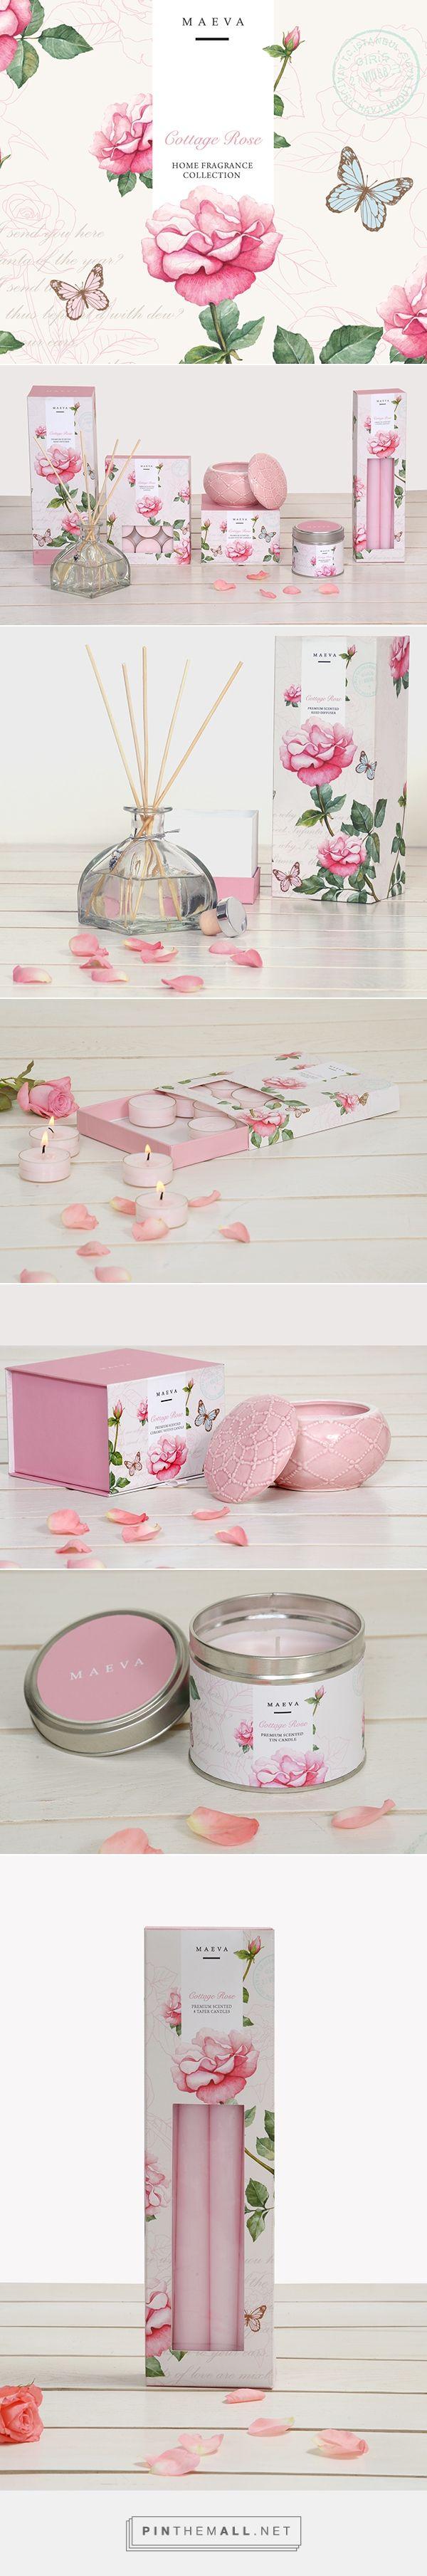 Cottage Rose Home Fragrance Branding and Packaging by Ram Kumar | Fivestar Branding – Design and Branding Agency & Inspiration Gallery